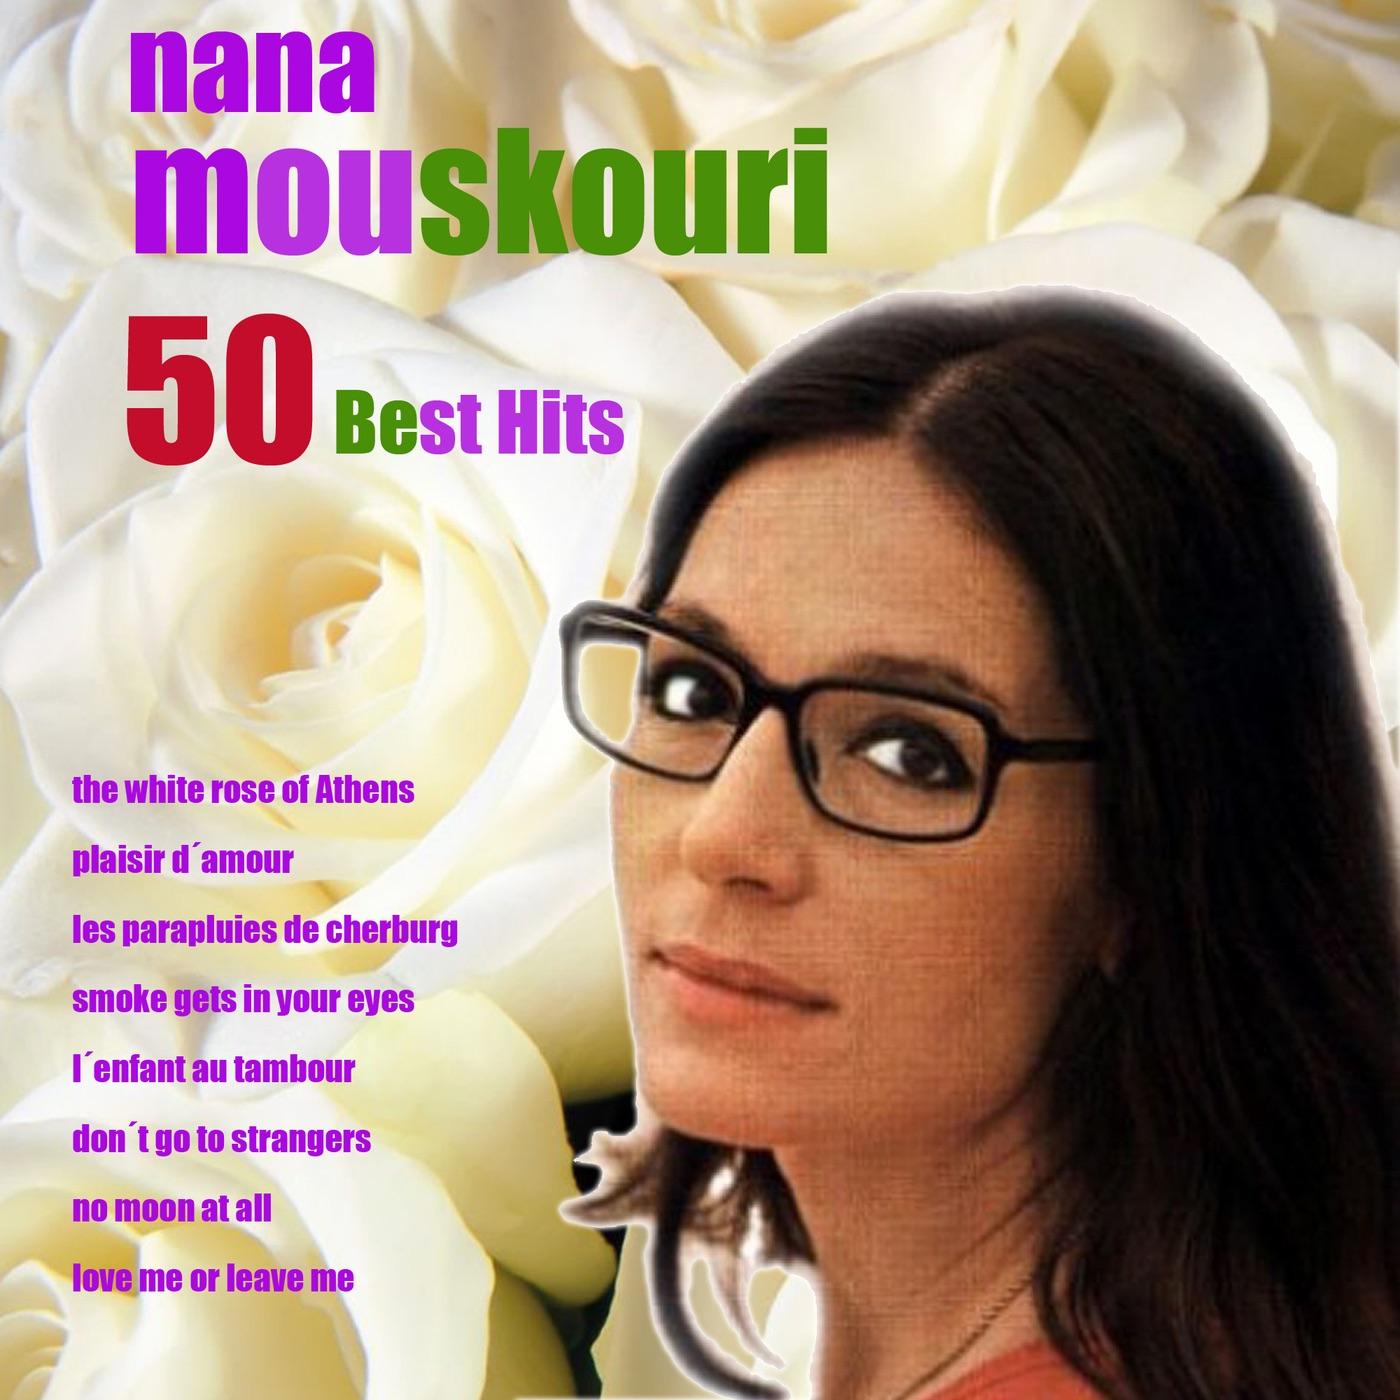 50 Best Hits